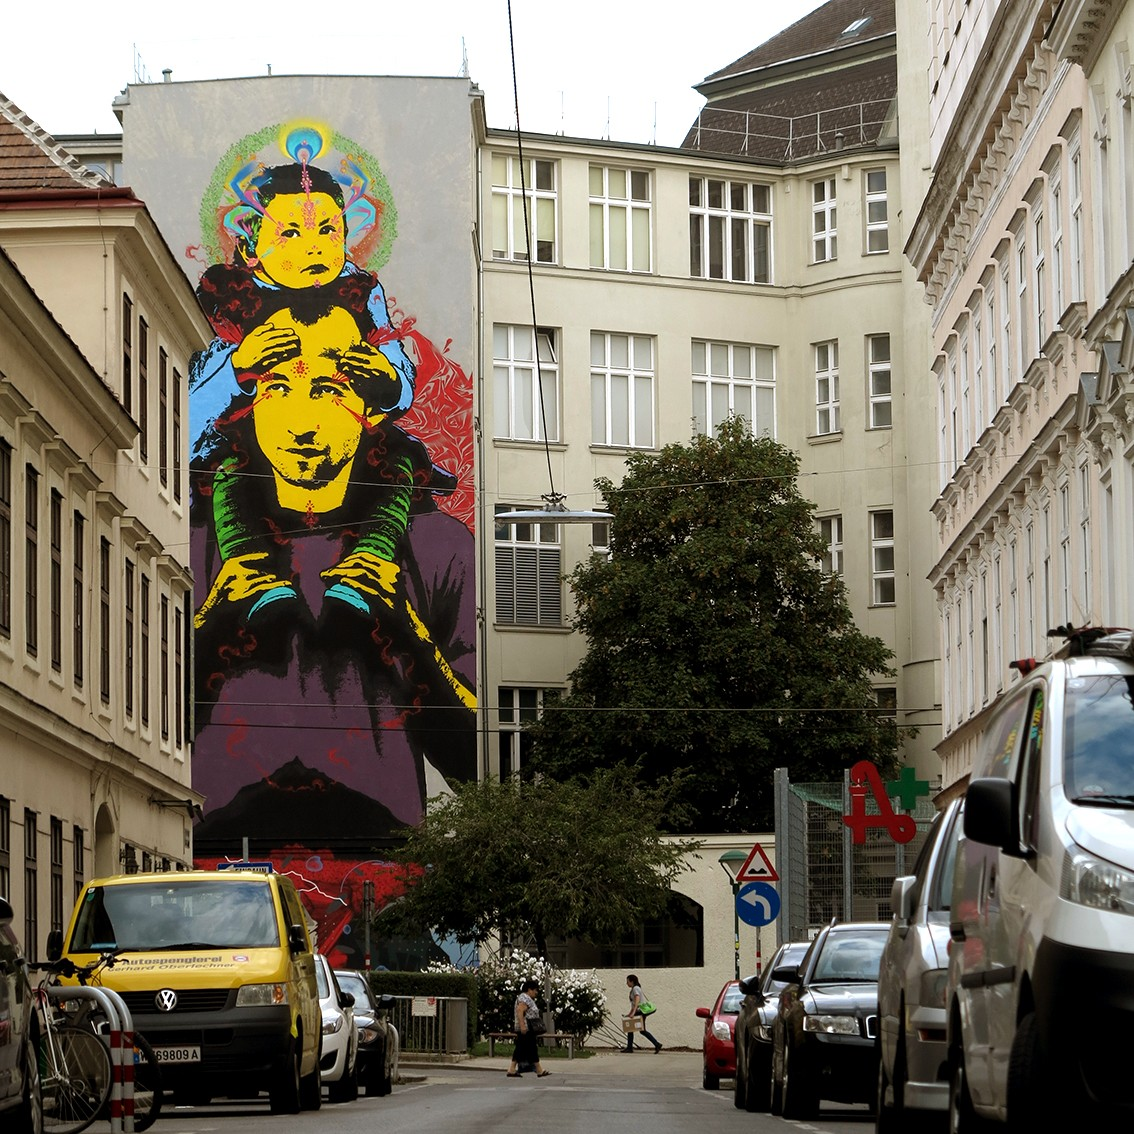 005_STINKFISH_VIENNA_AUSTRIA_2016